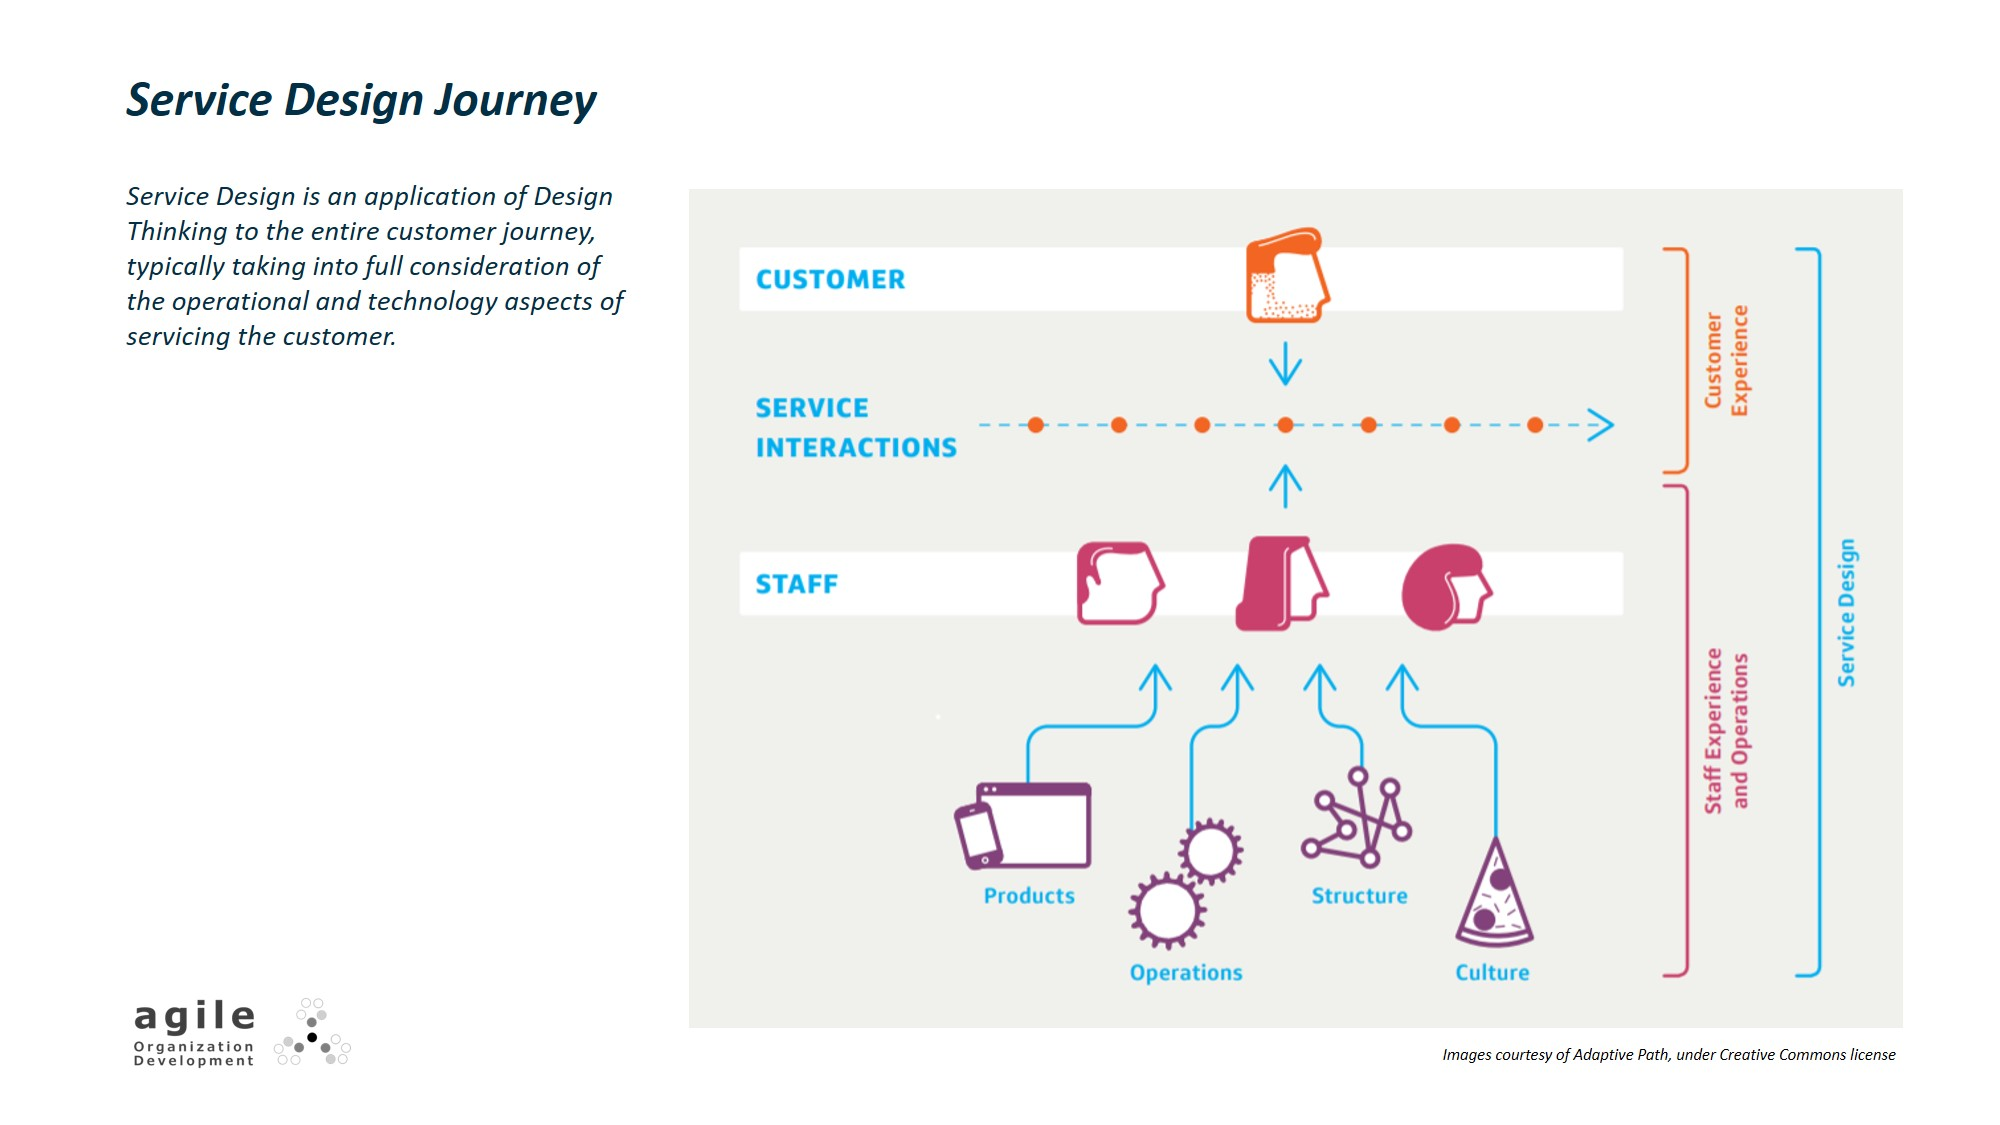 Service Design journey